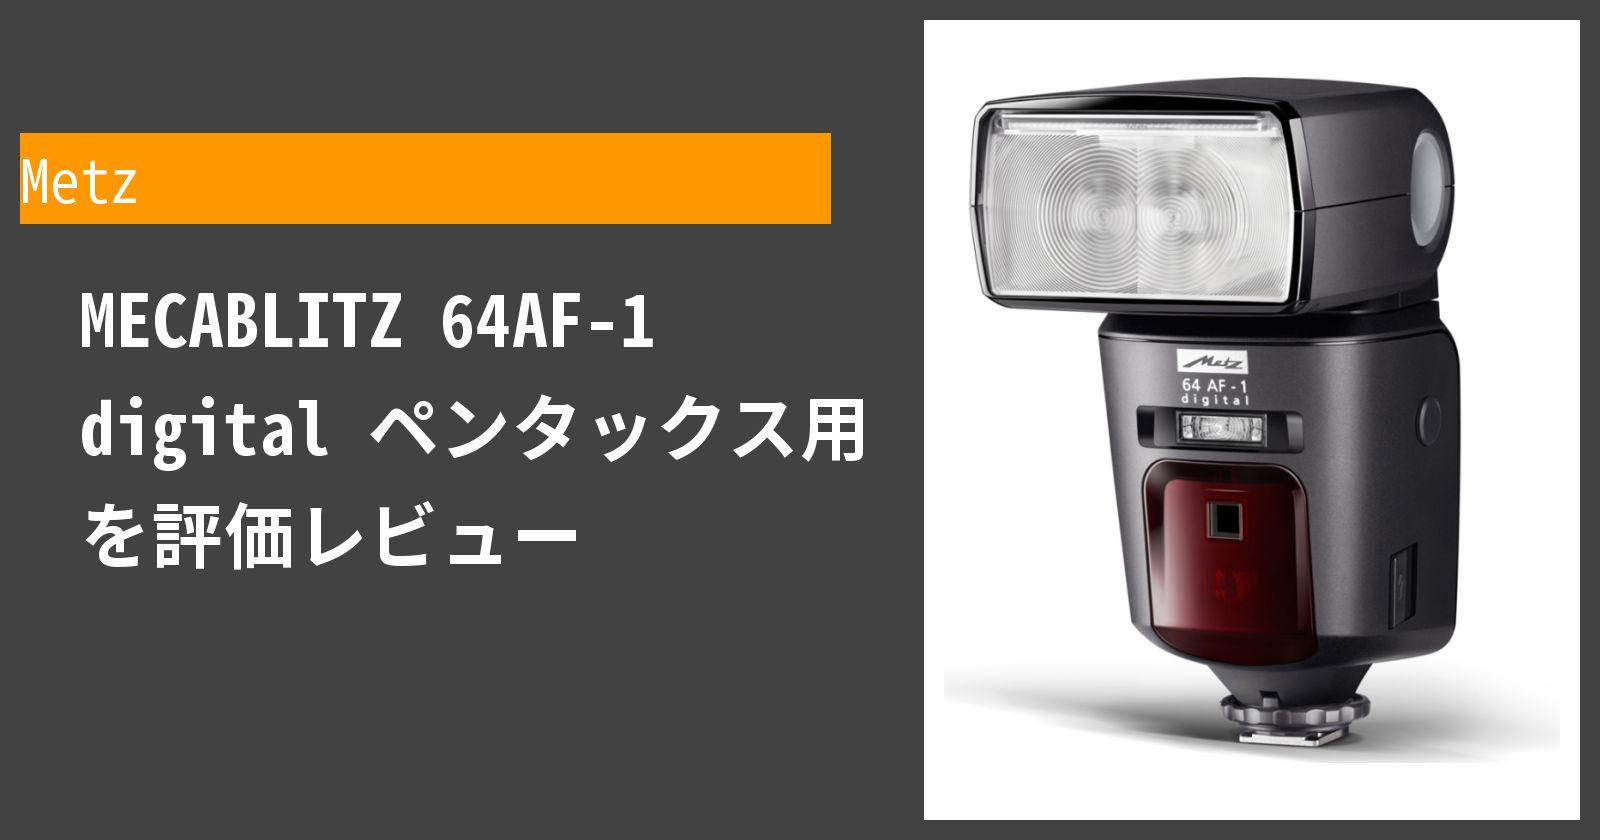 MECABLITZ 64AF-1 digital ペンタックス用を徹底評価